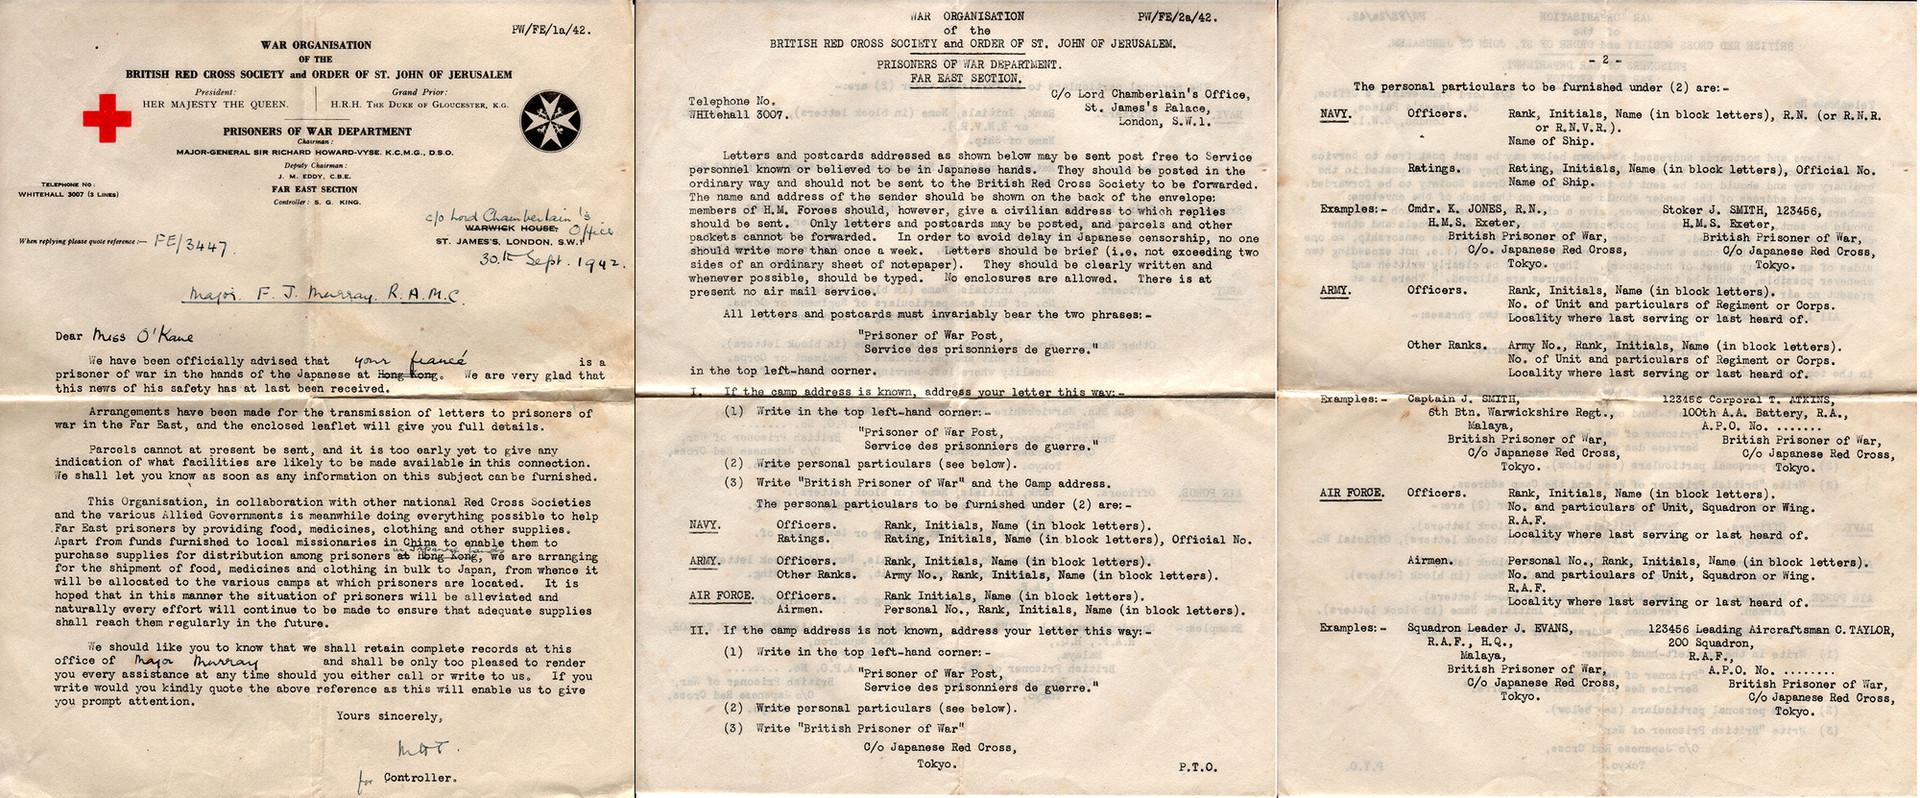 1942.09.30. Red Cross